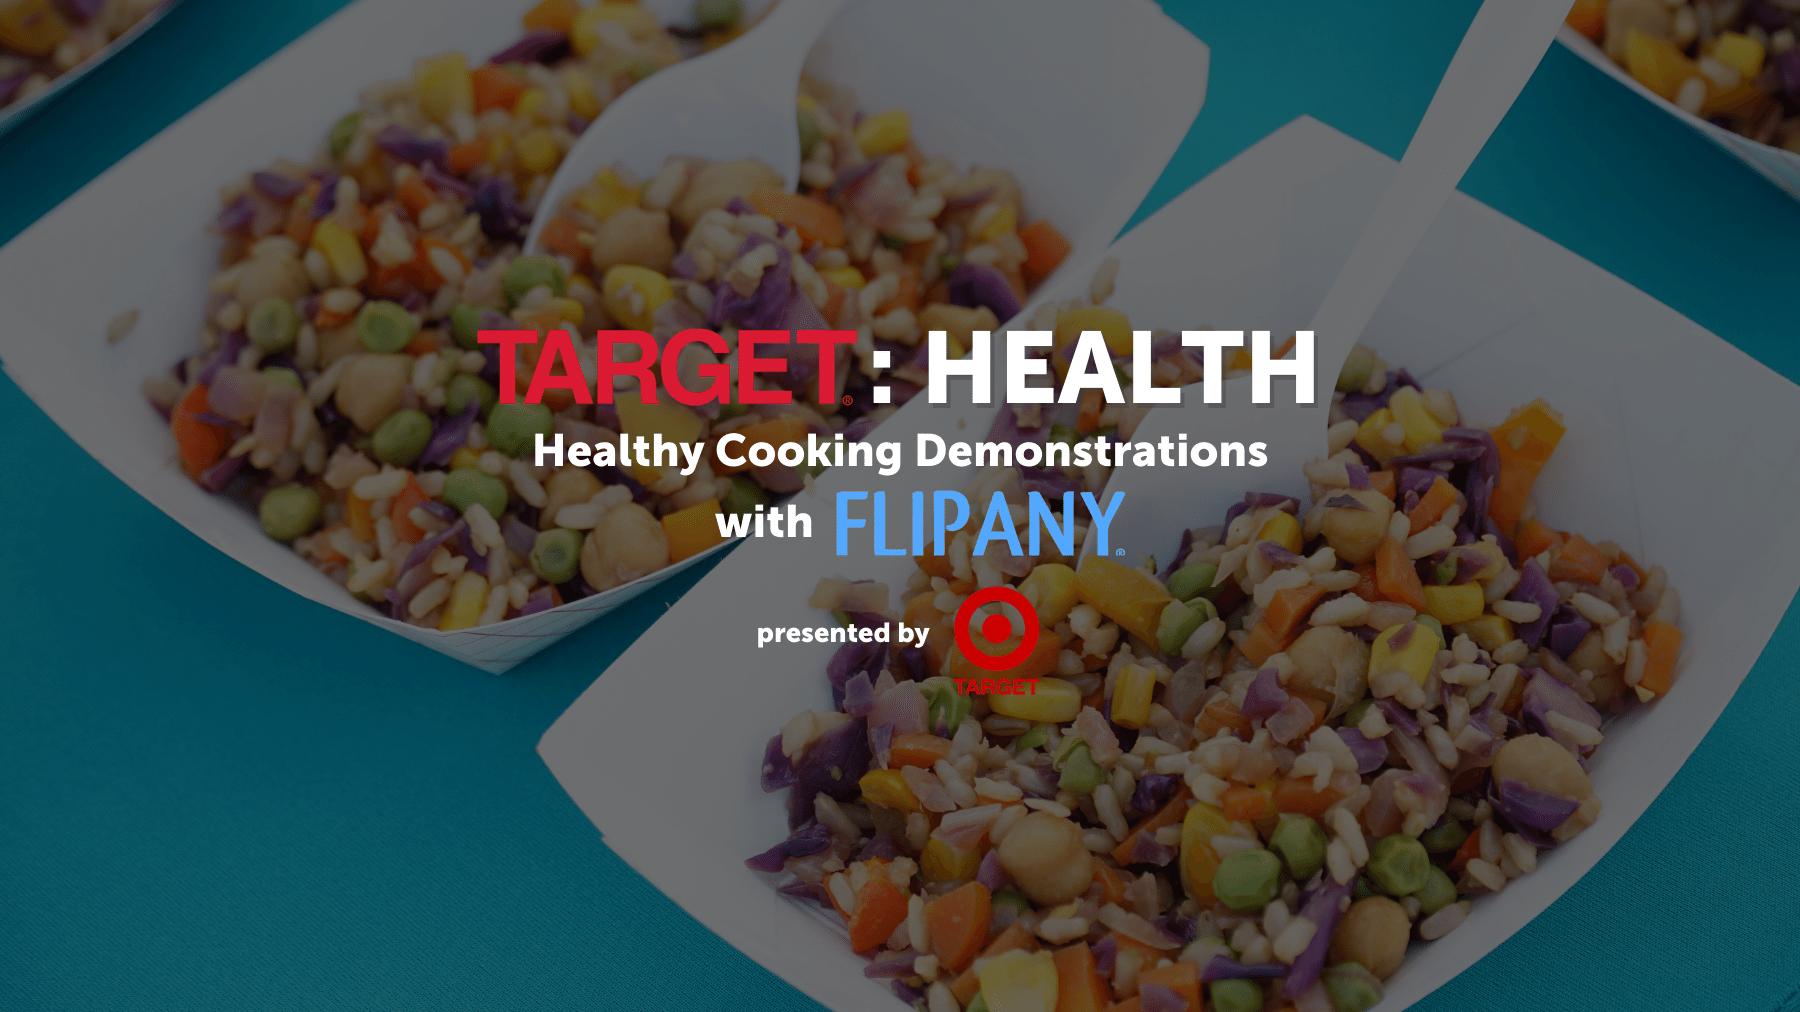 Target: Health